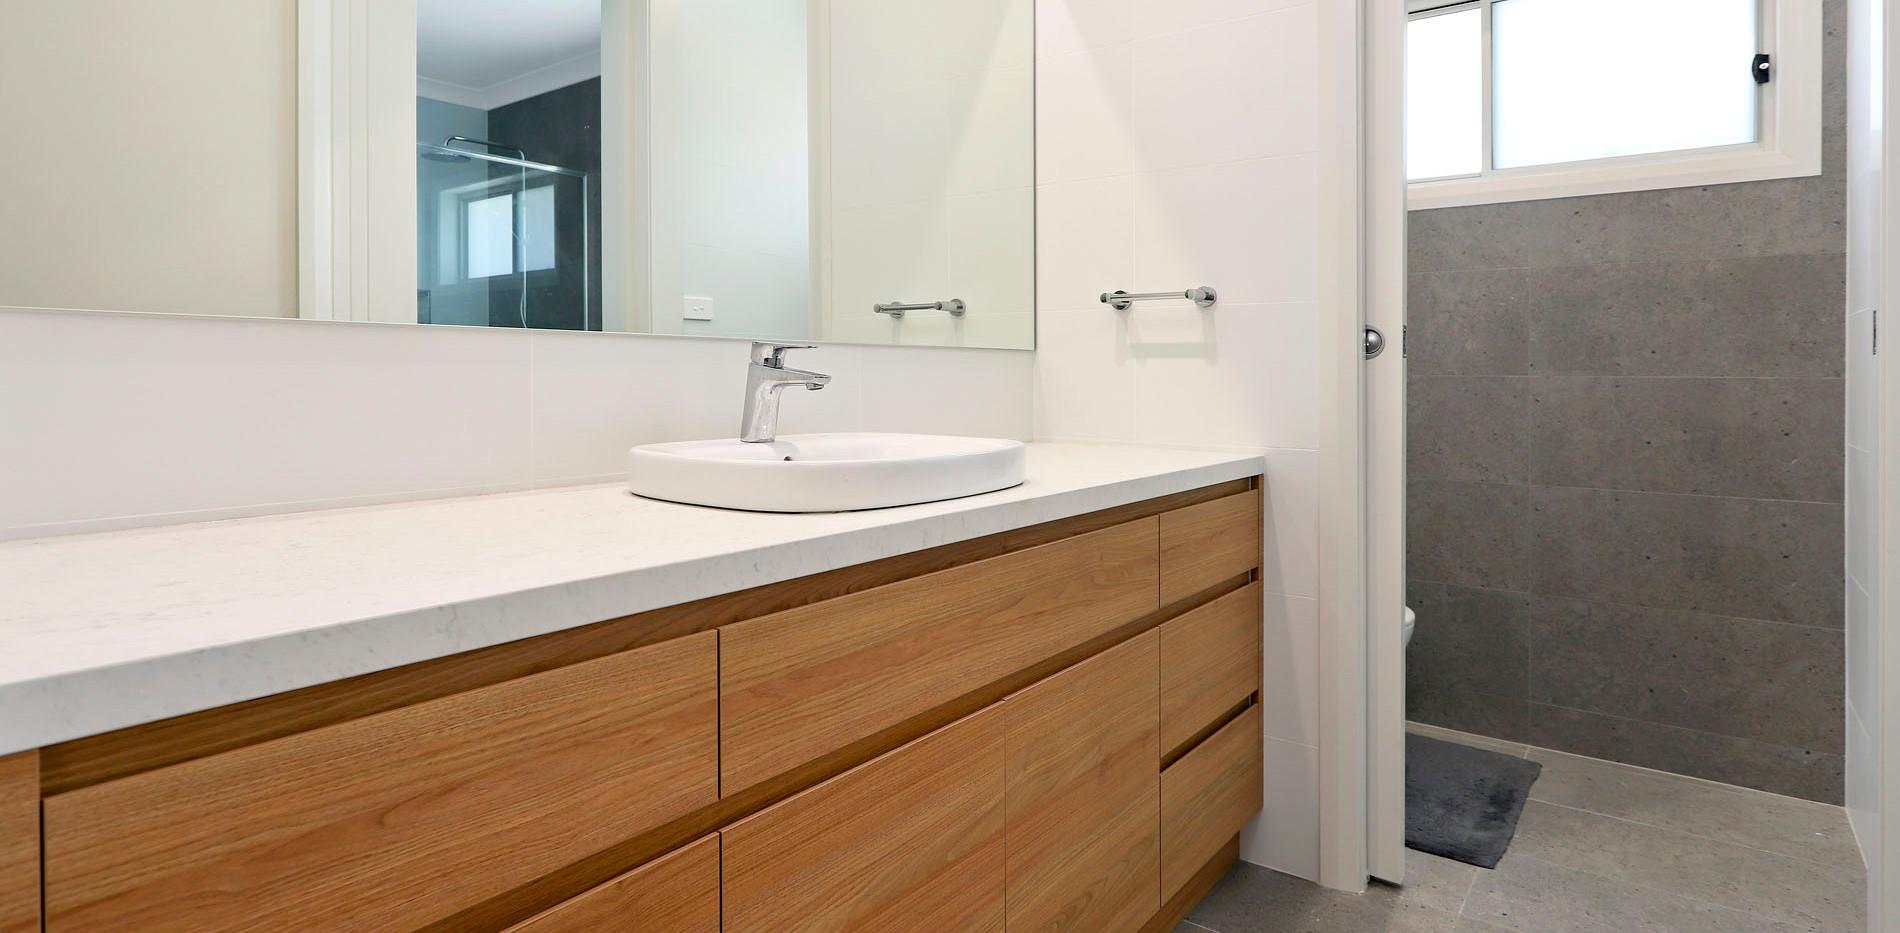 Small Bathrooms-Powder Rooms (13)